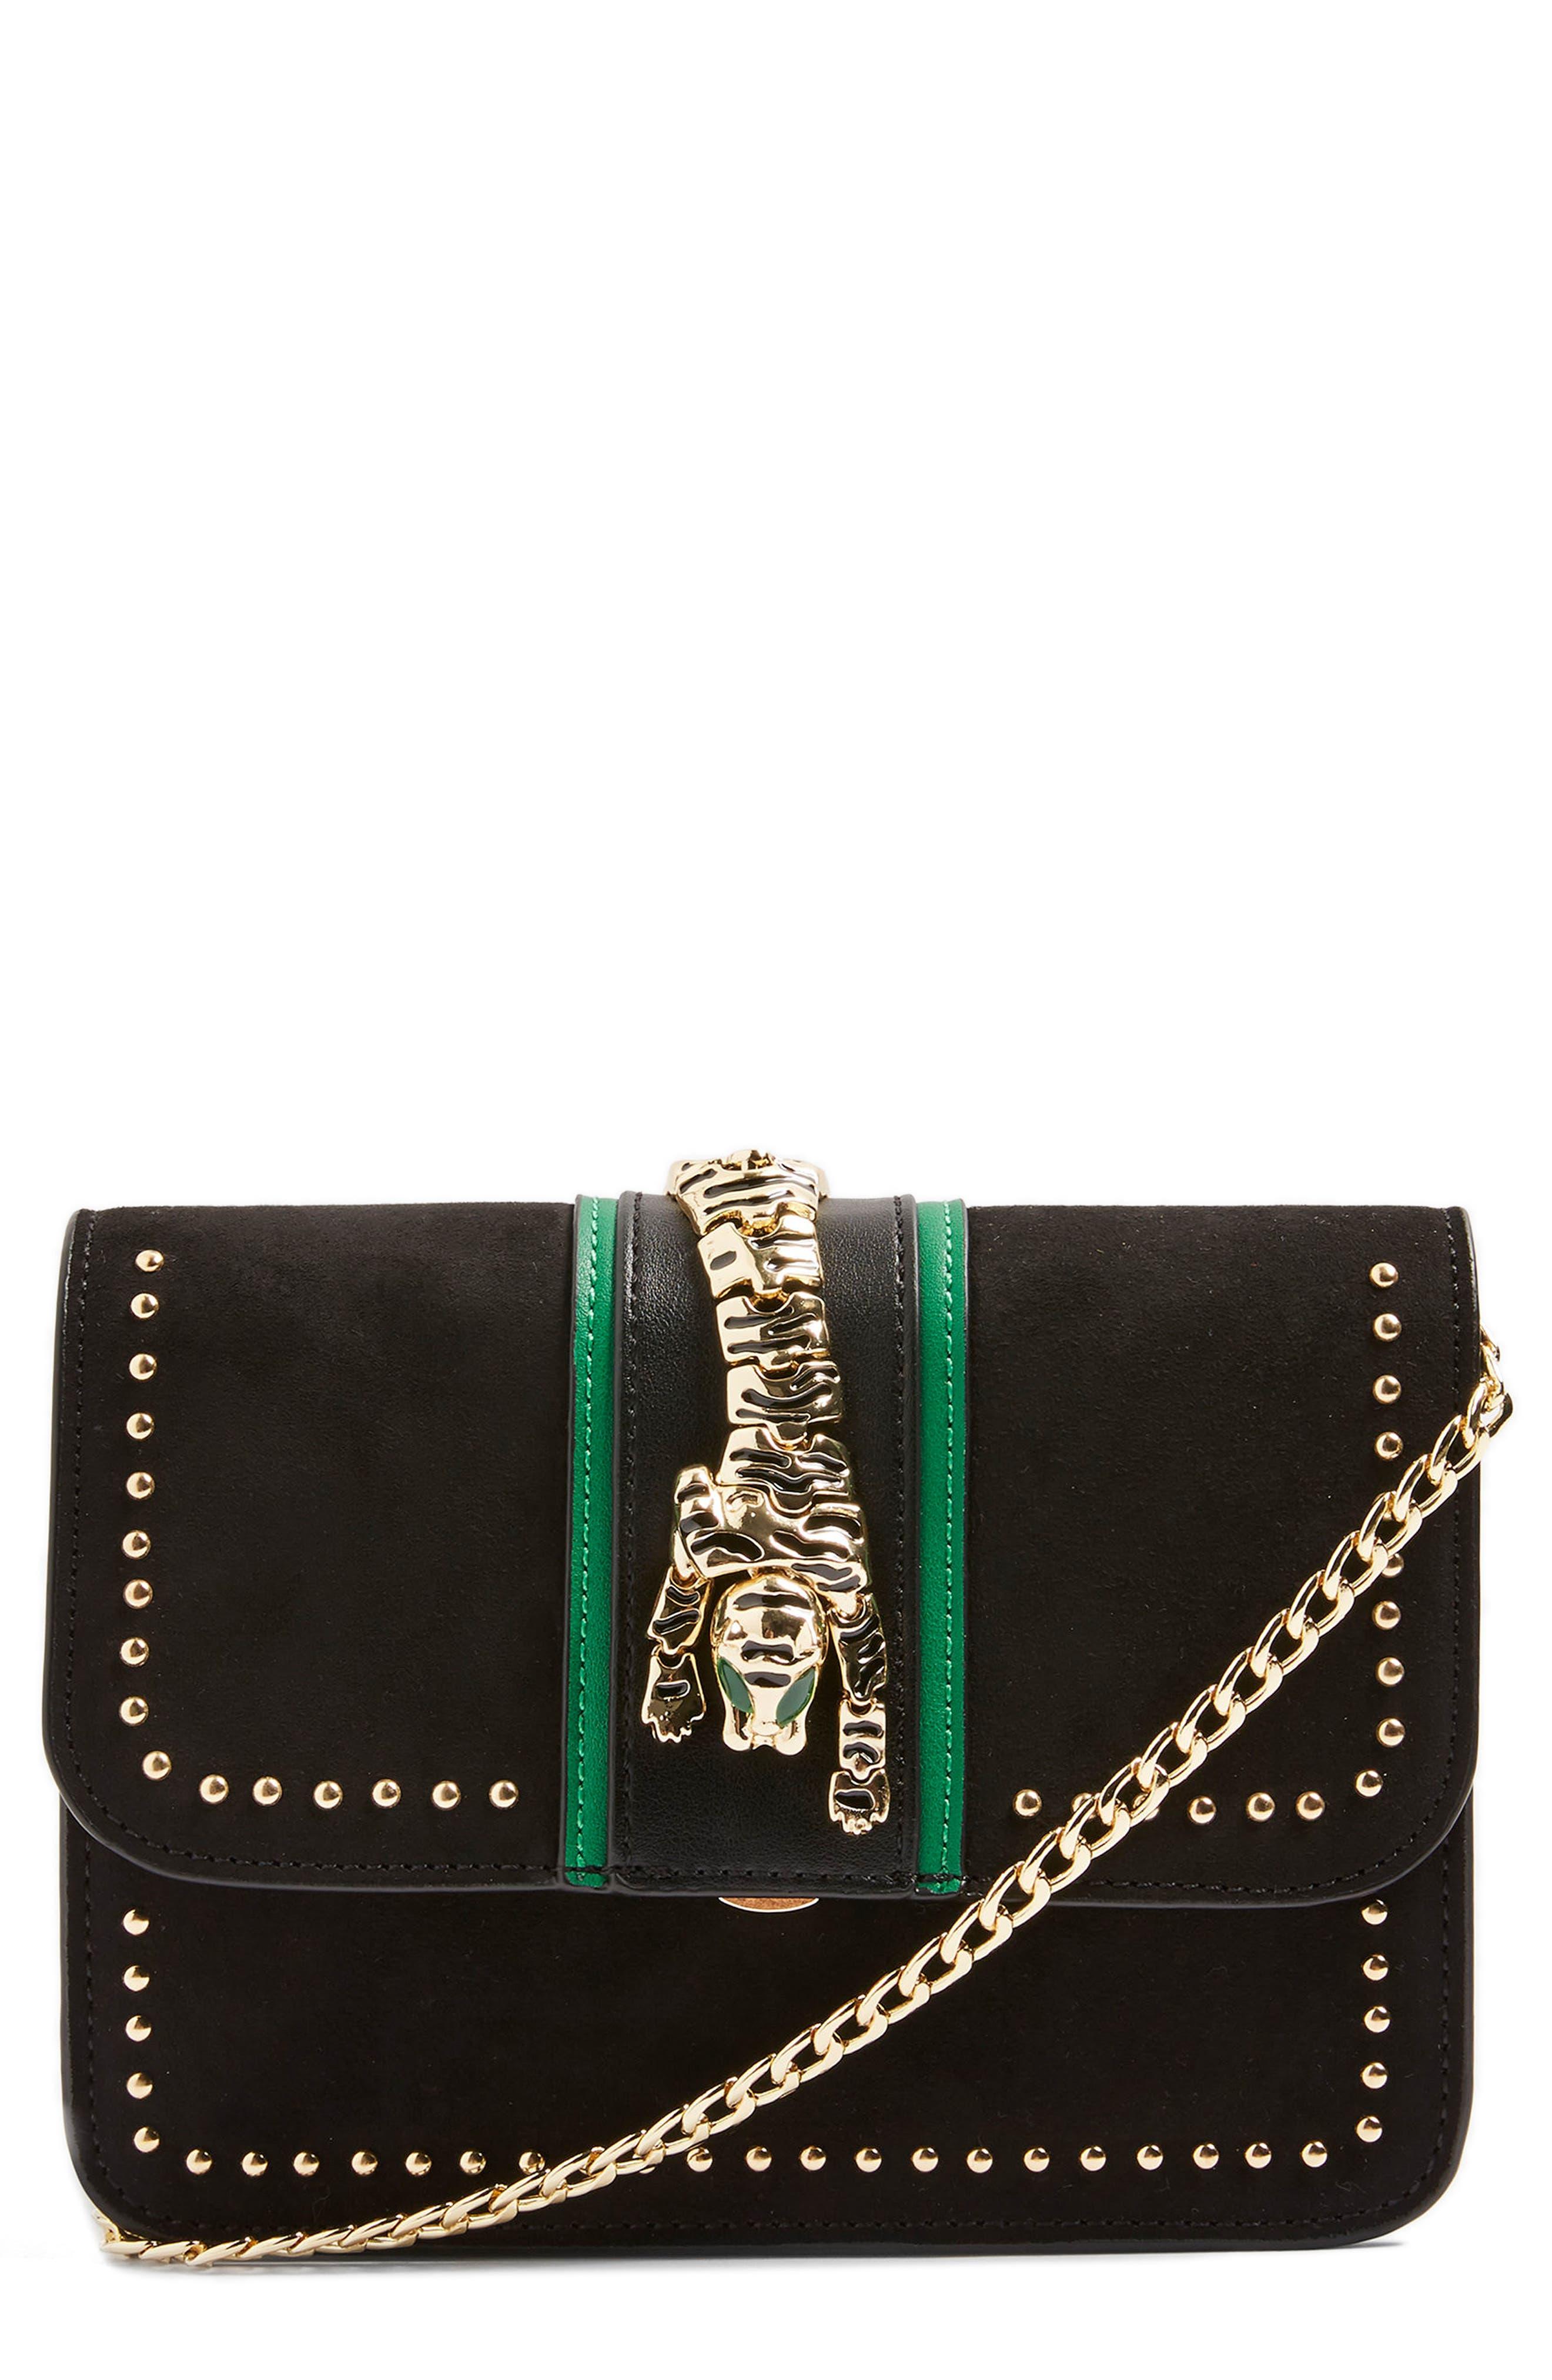 Tiger Crossbody Bag,                             Main thumbnail 1, color,                             Black Multi